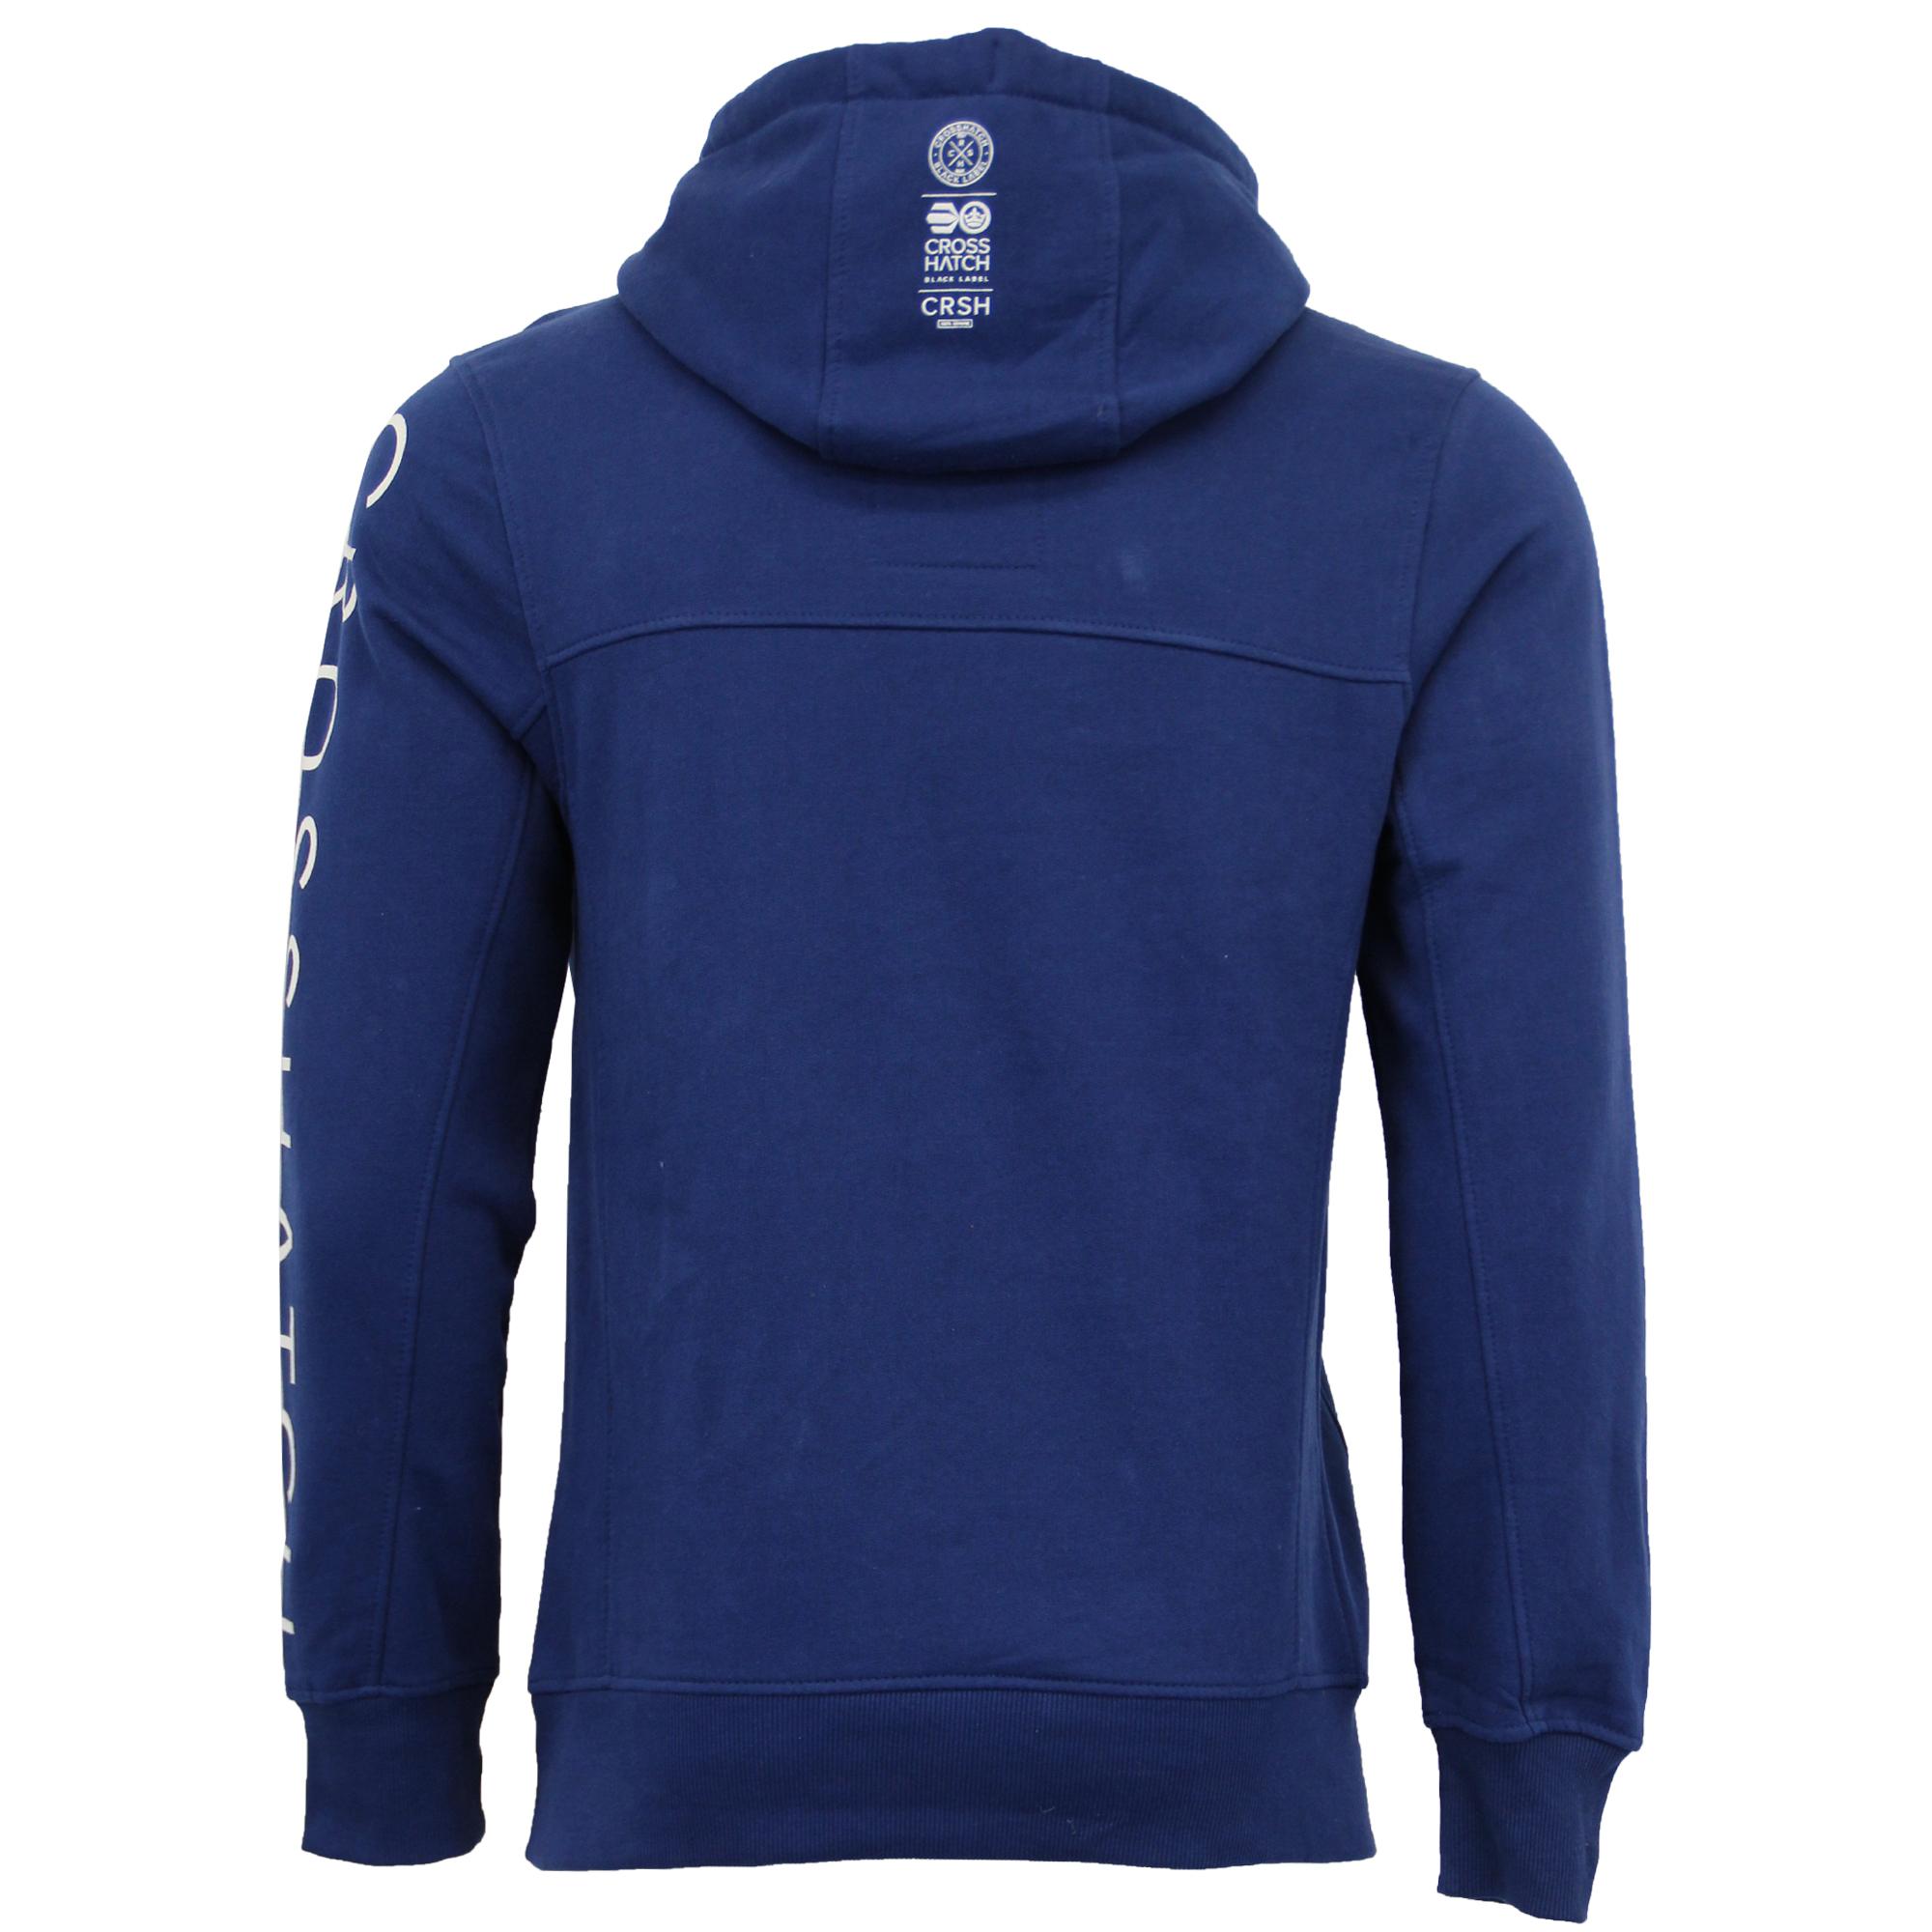 Mens-Sweatshirt-Crosshatch-Hoodie-Top-Embossed-Logo-Print-Sweat-Fleece-Lined-New thumbnail 8